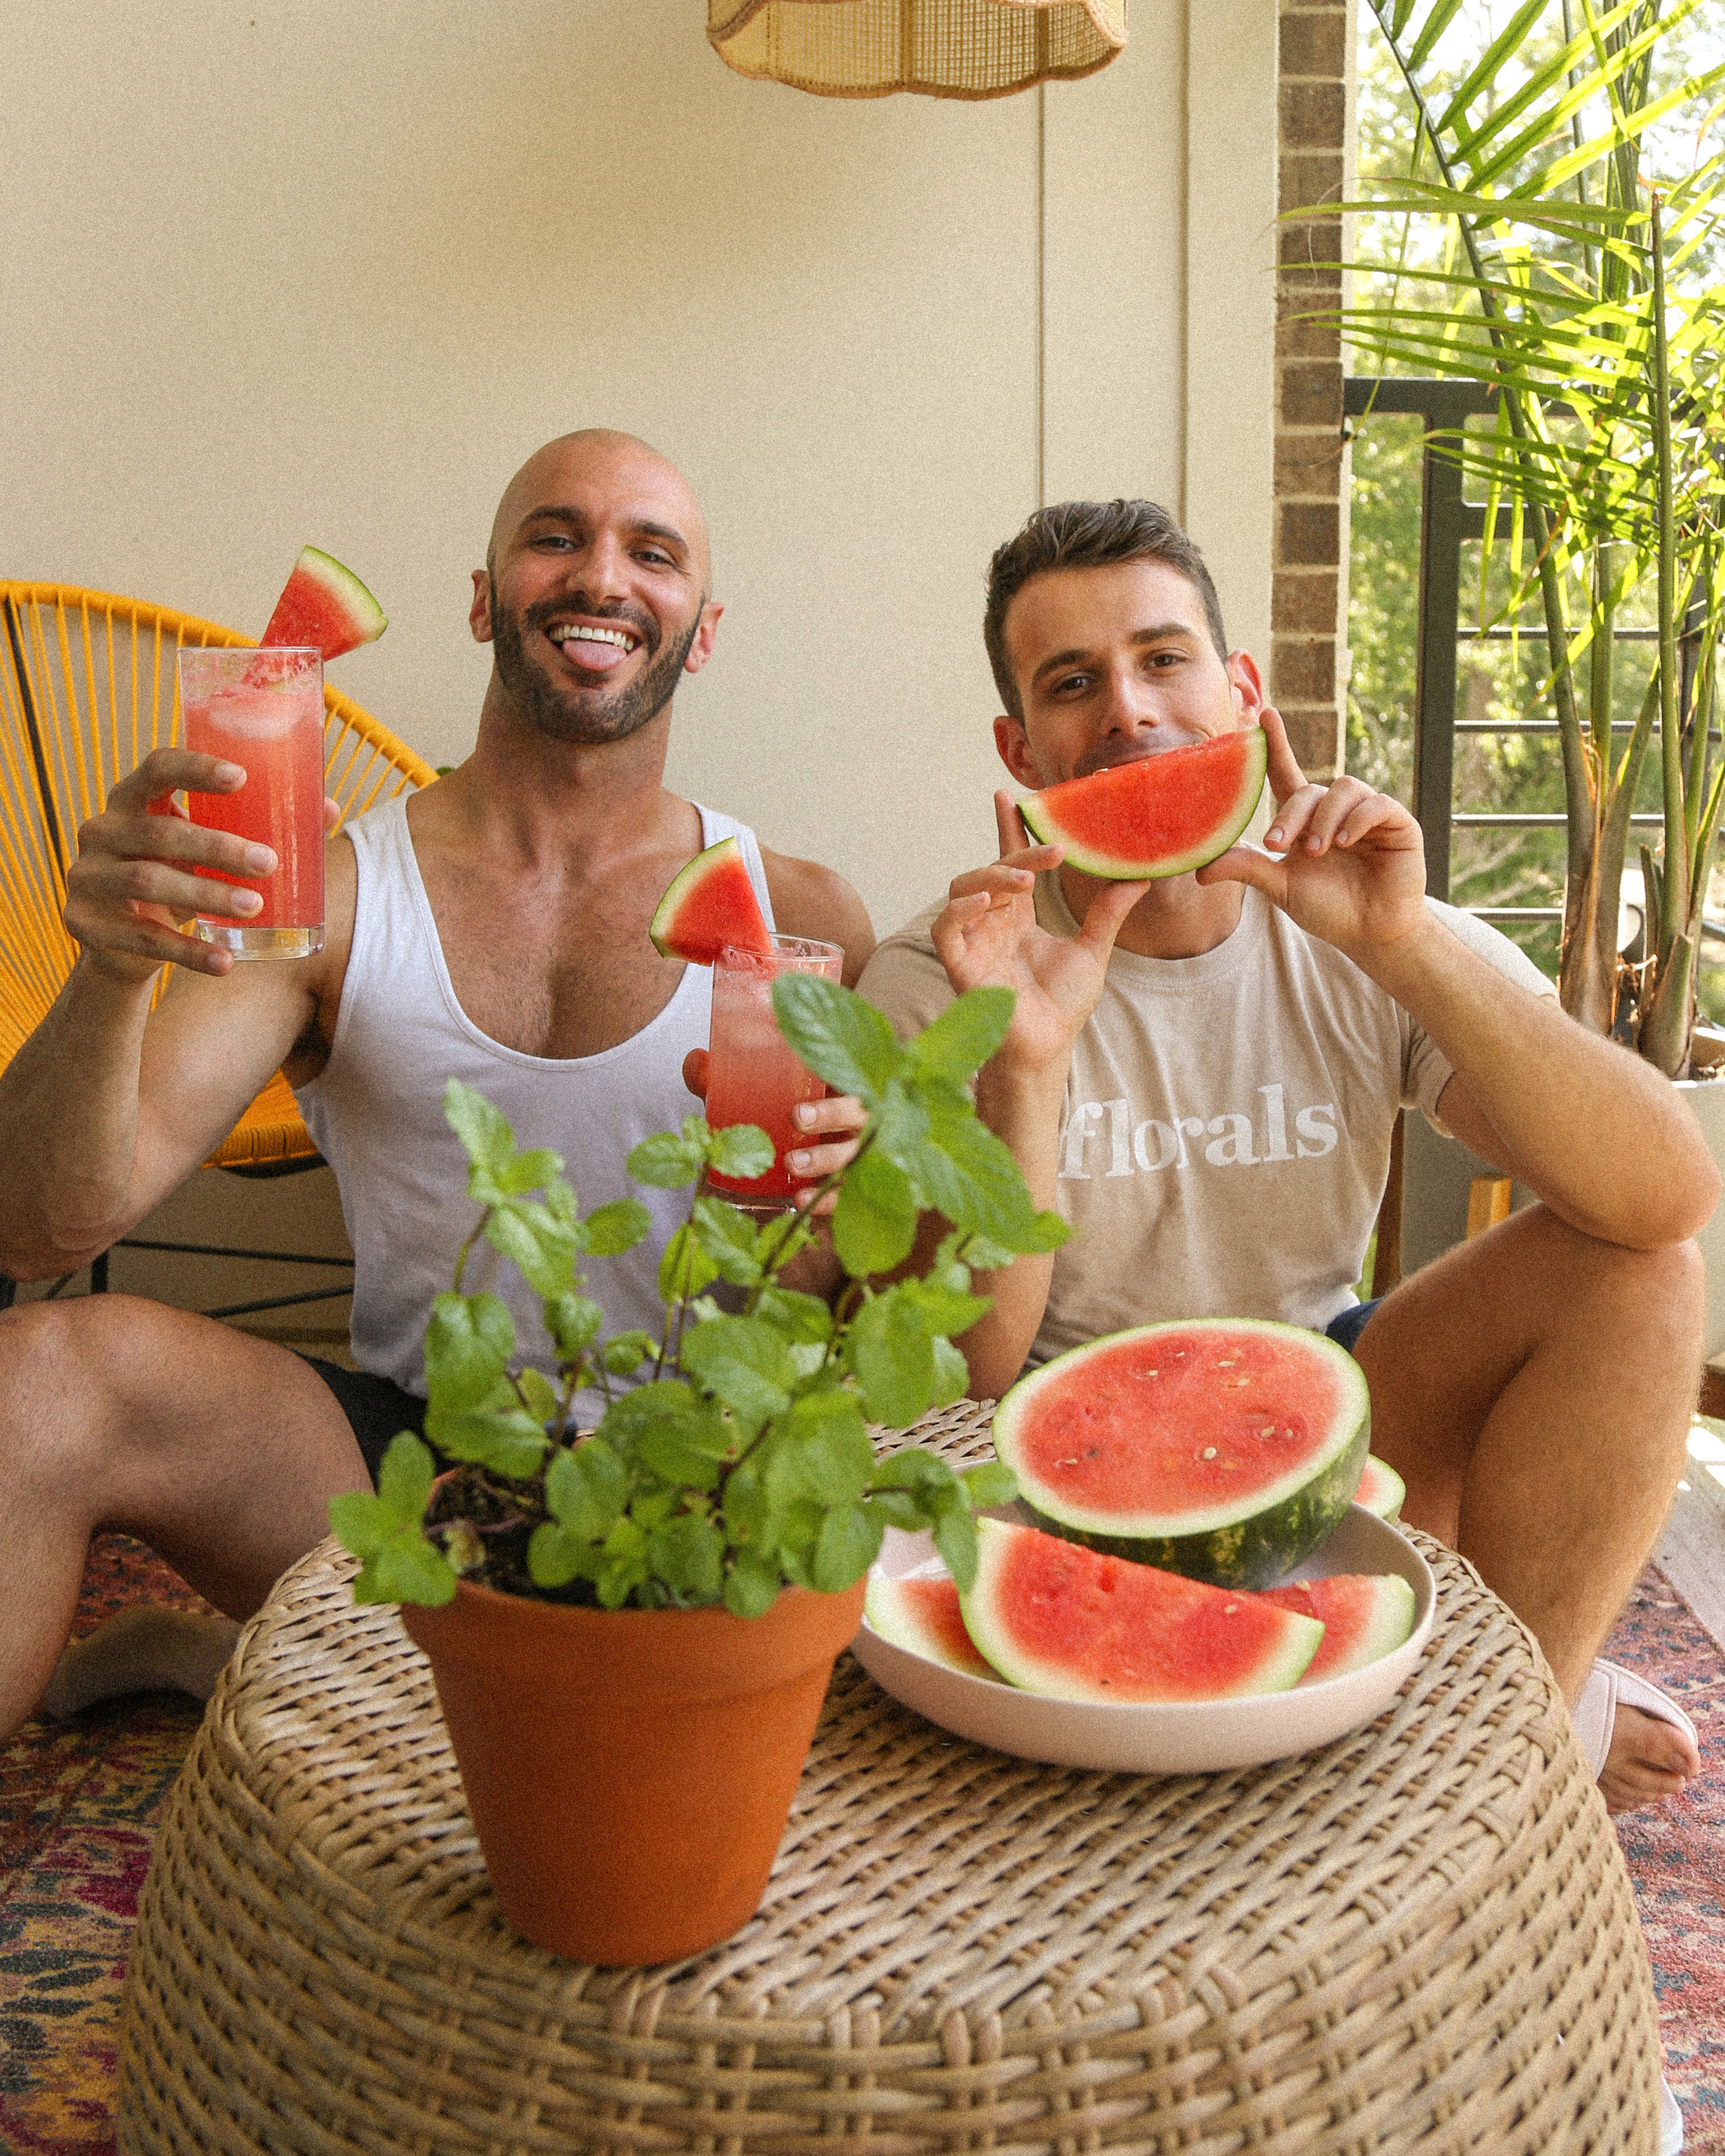 watermeloncocktails1 (1 of 1).JPG